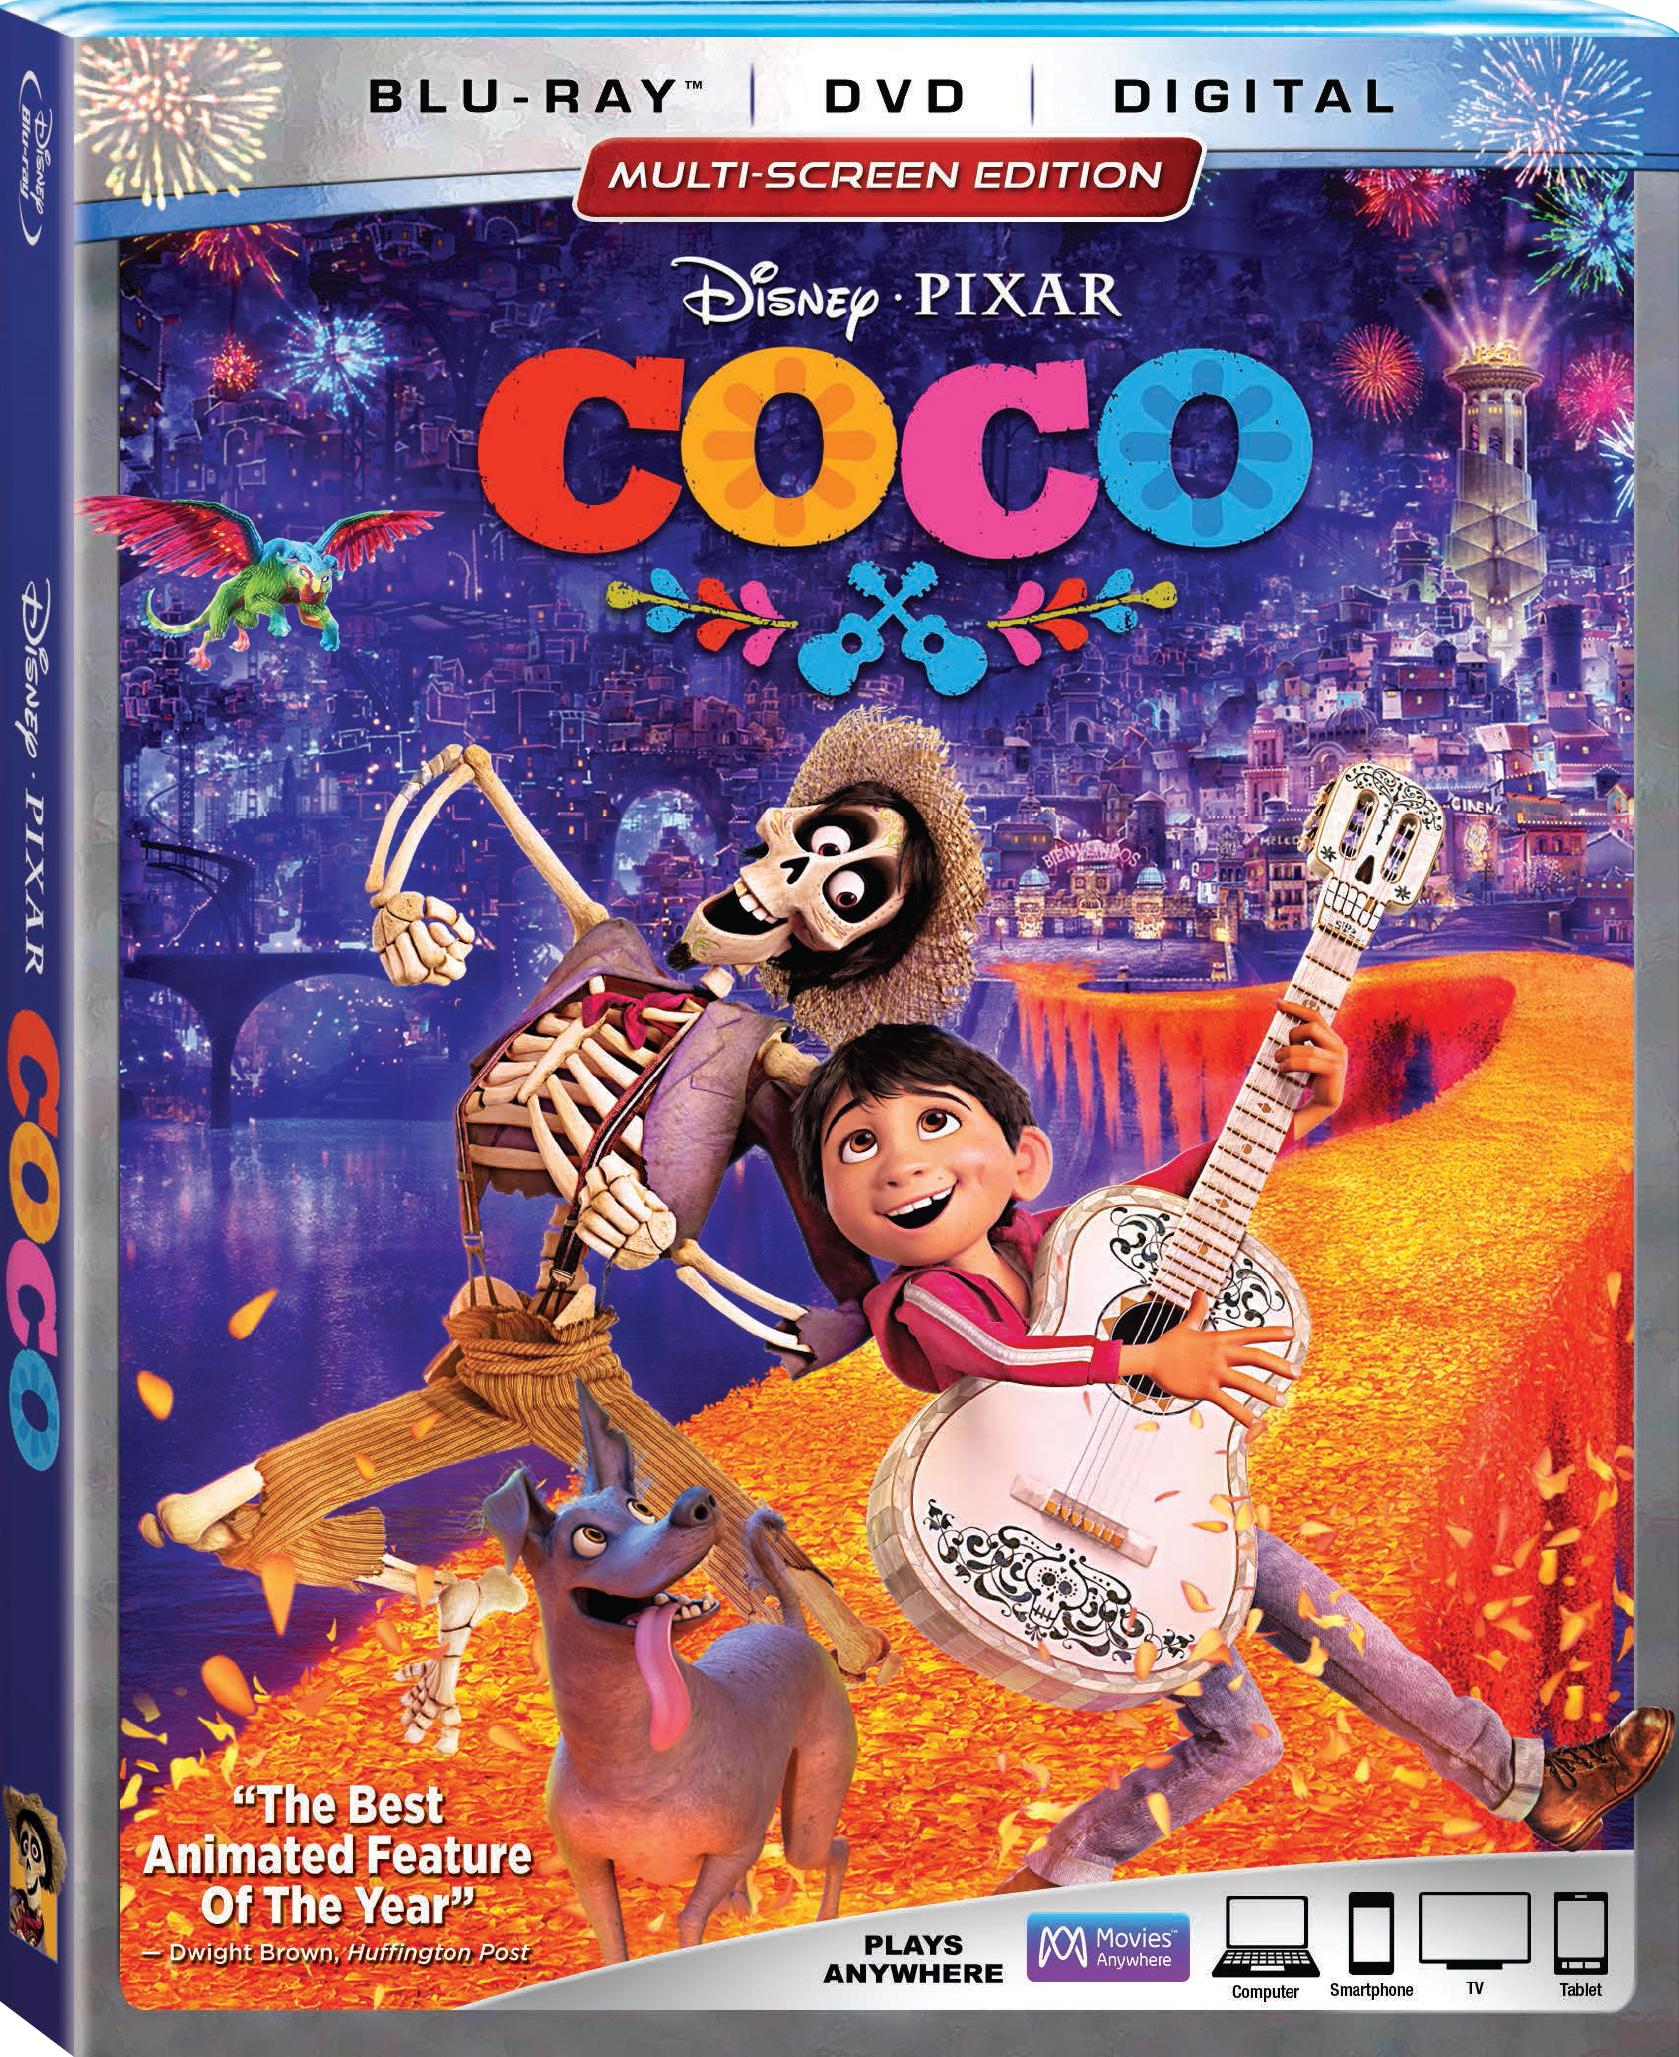 Disney Pixar's COCO on Blu-Ray Feb 27 + Giveaway